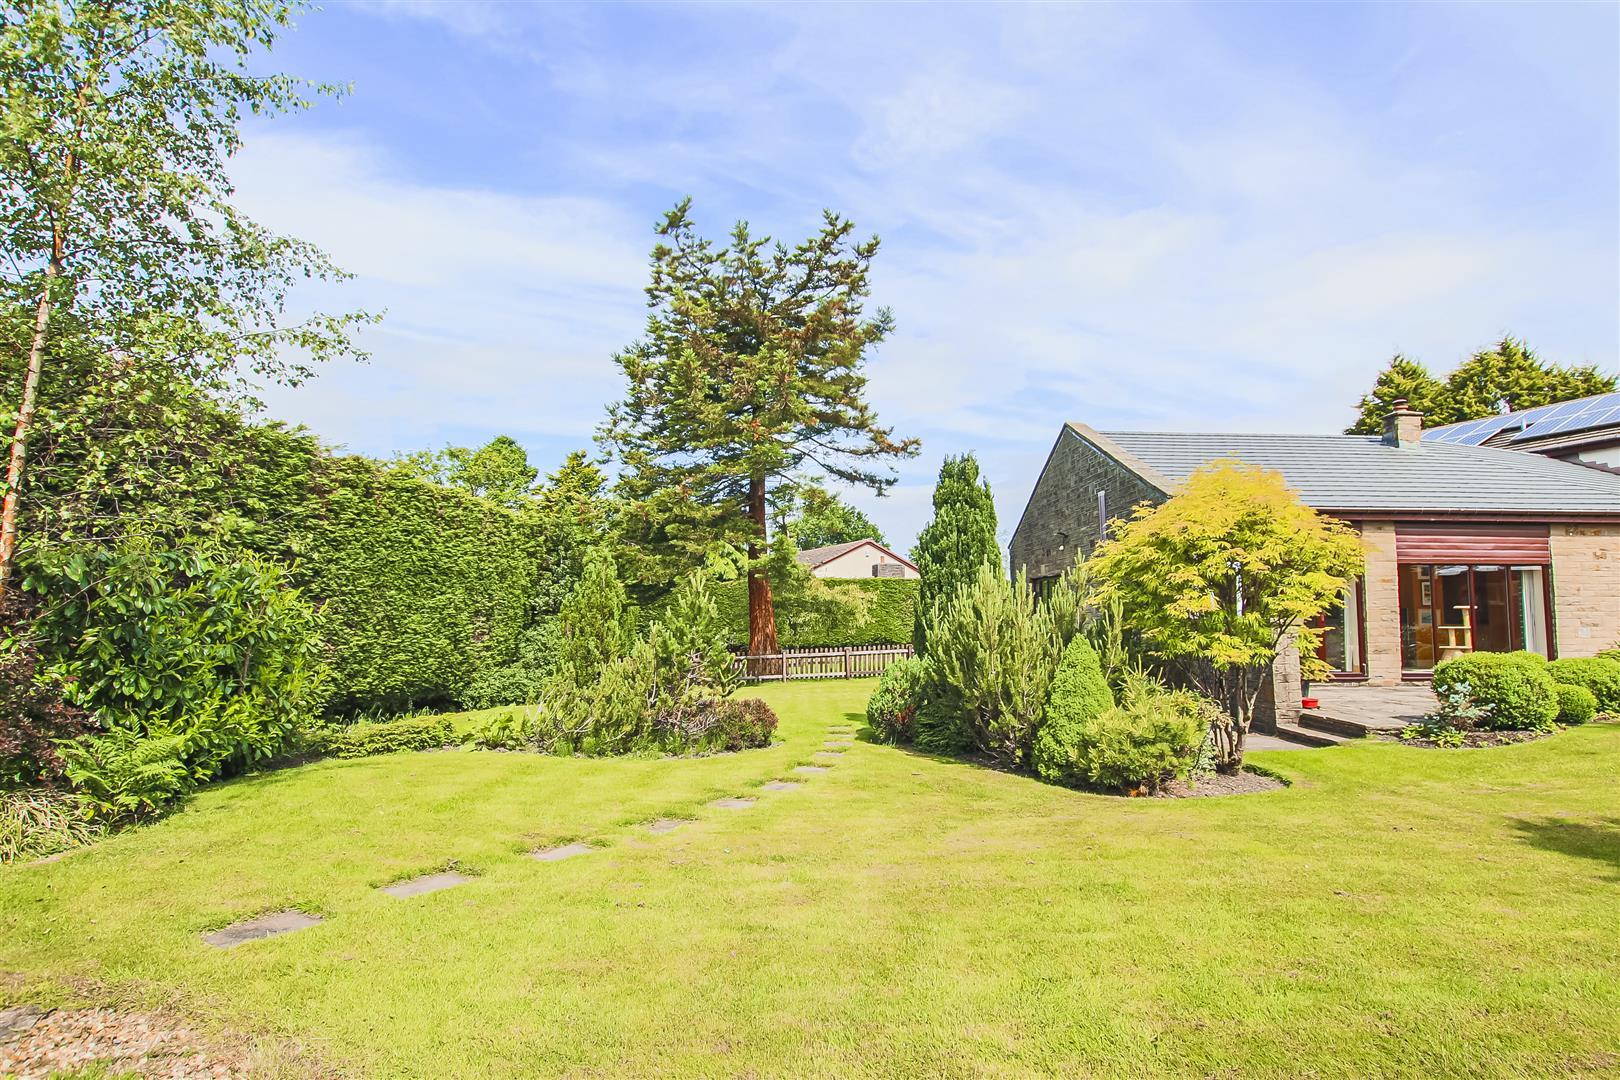 6 Bedroom Detached House For Sale - Garden